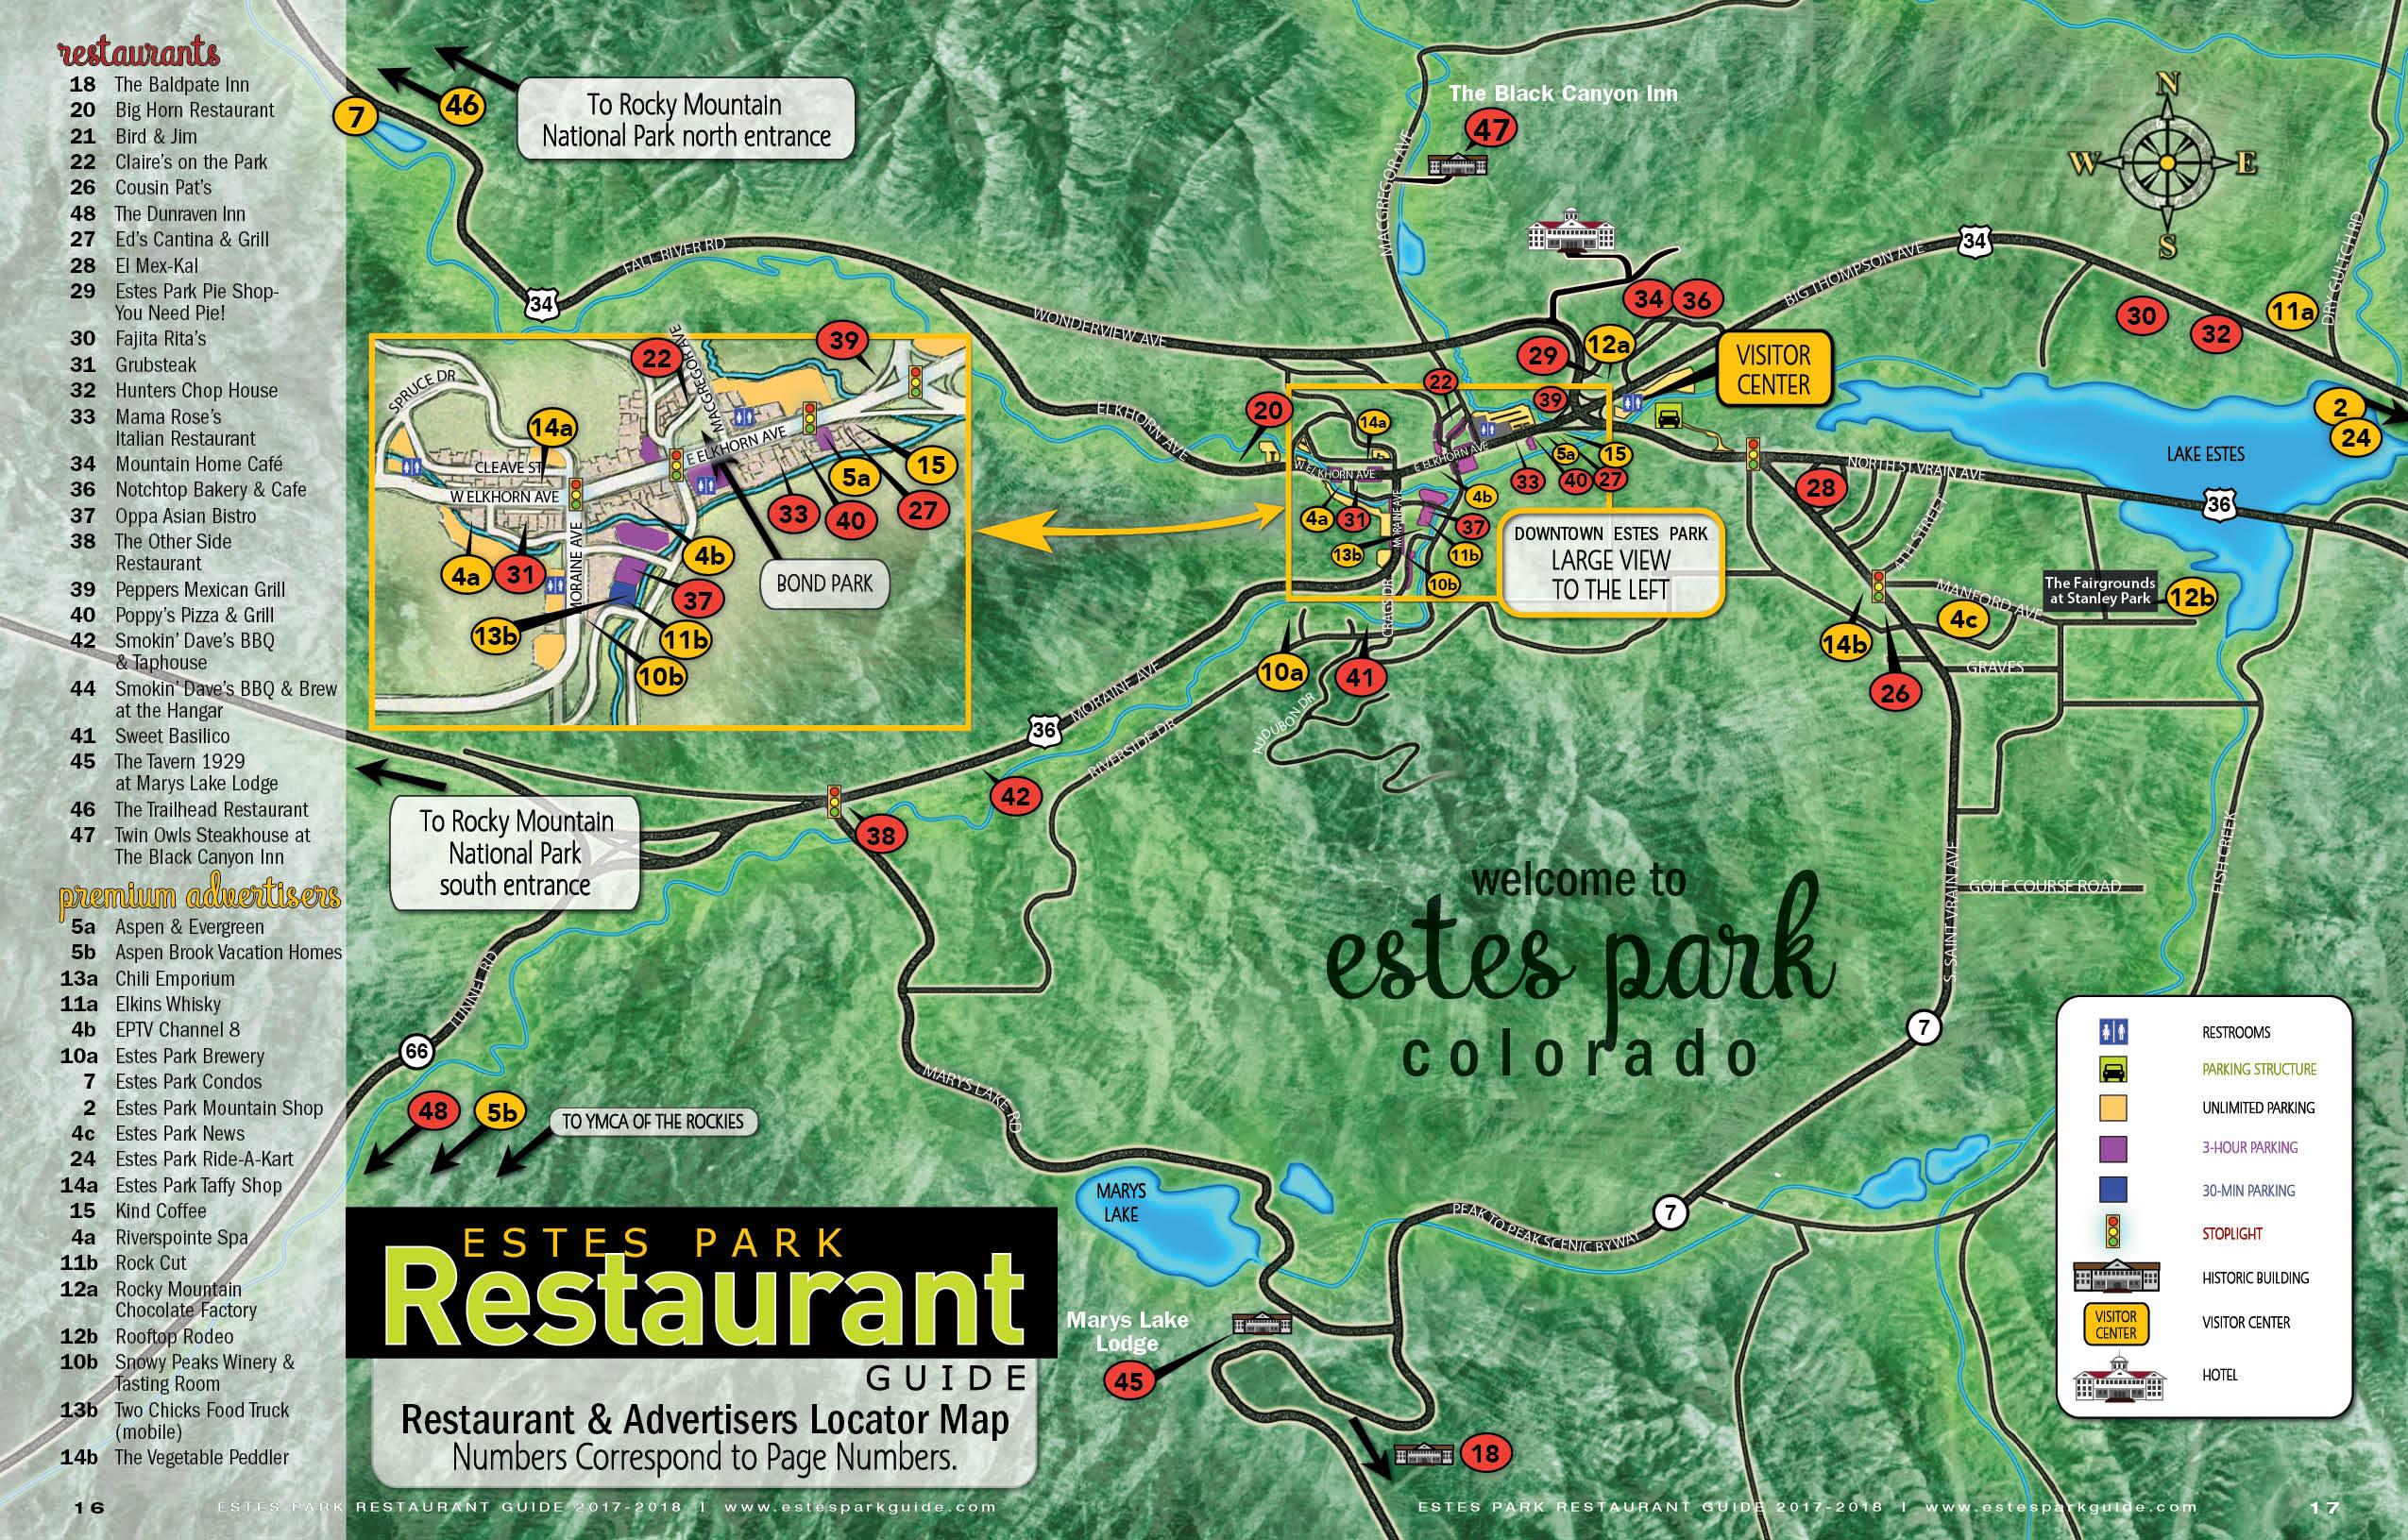 Estes Park Restaurant Map | Free GuestGuide Publications